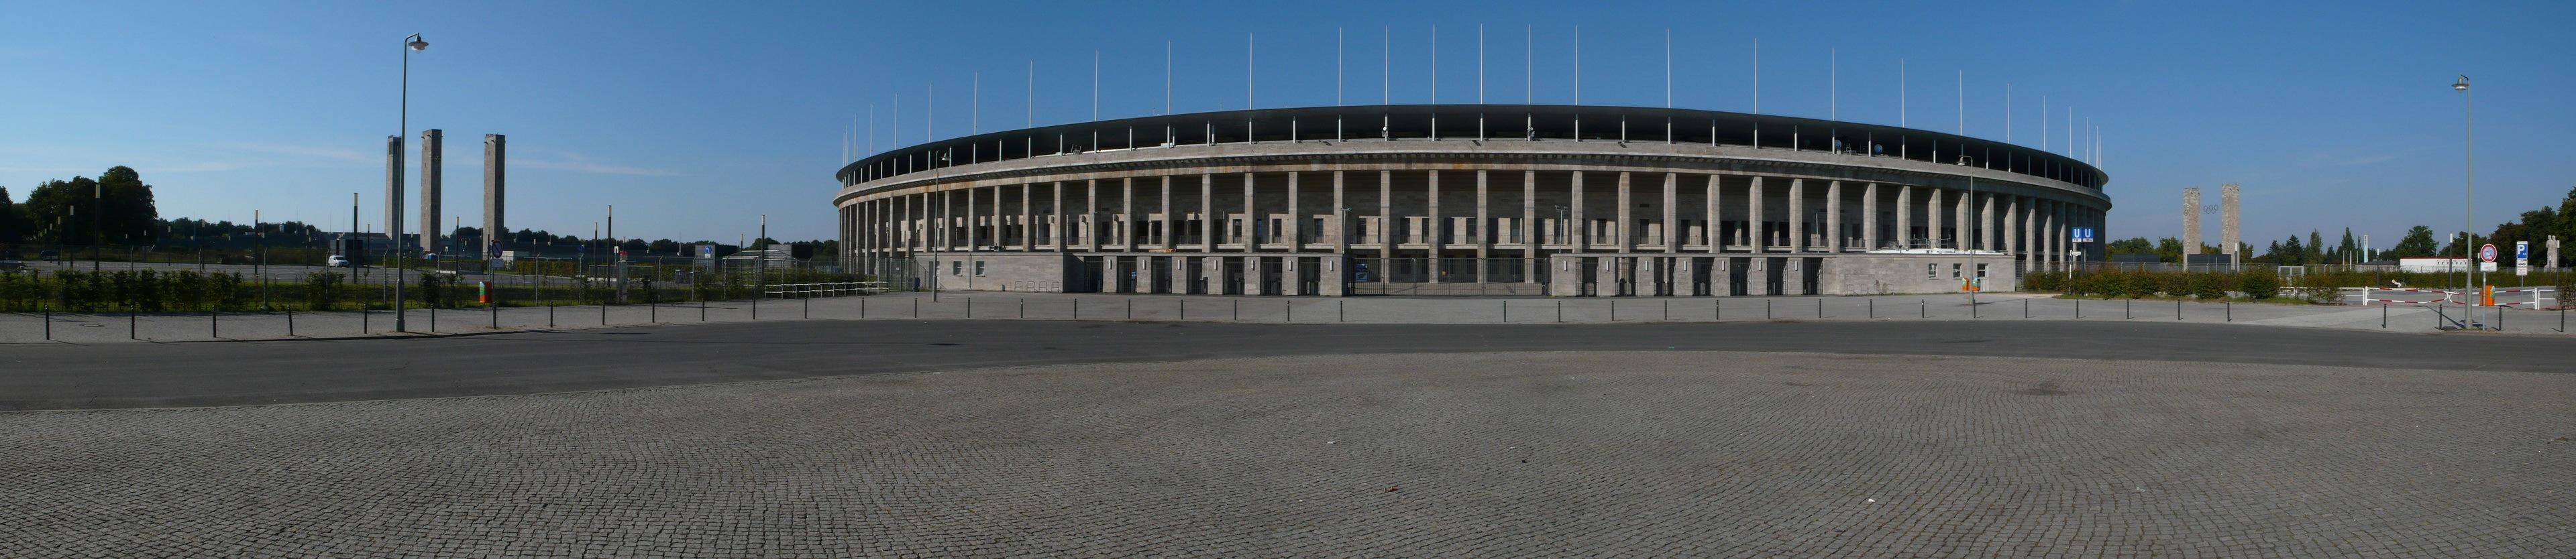 berlin_olympiastadion